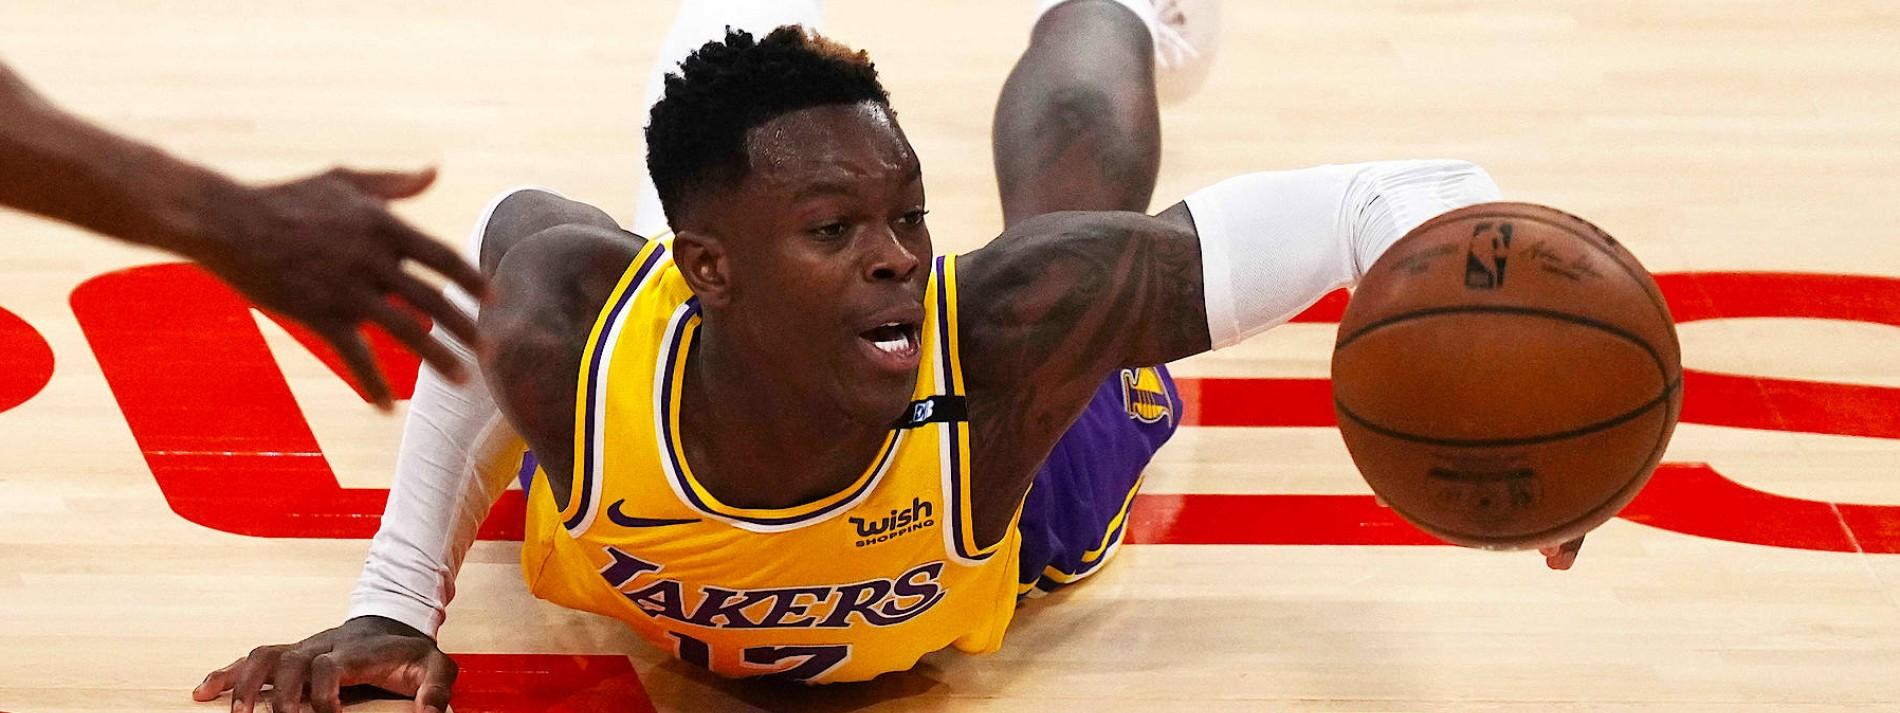 Misslungenes Experiment bei den Lakers